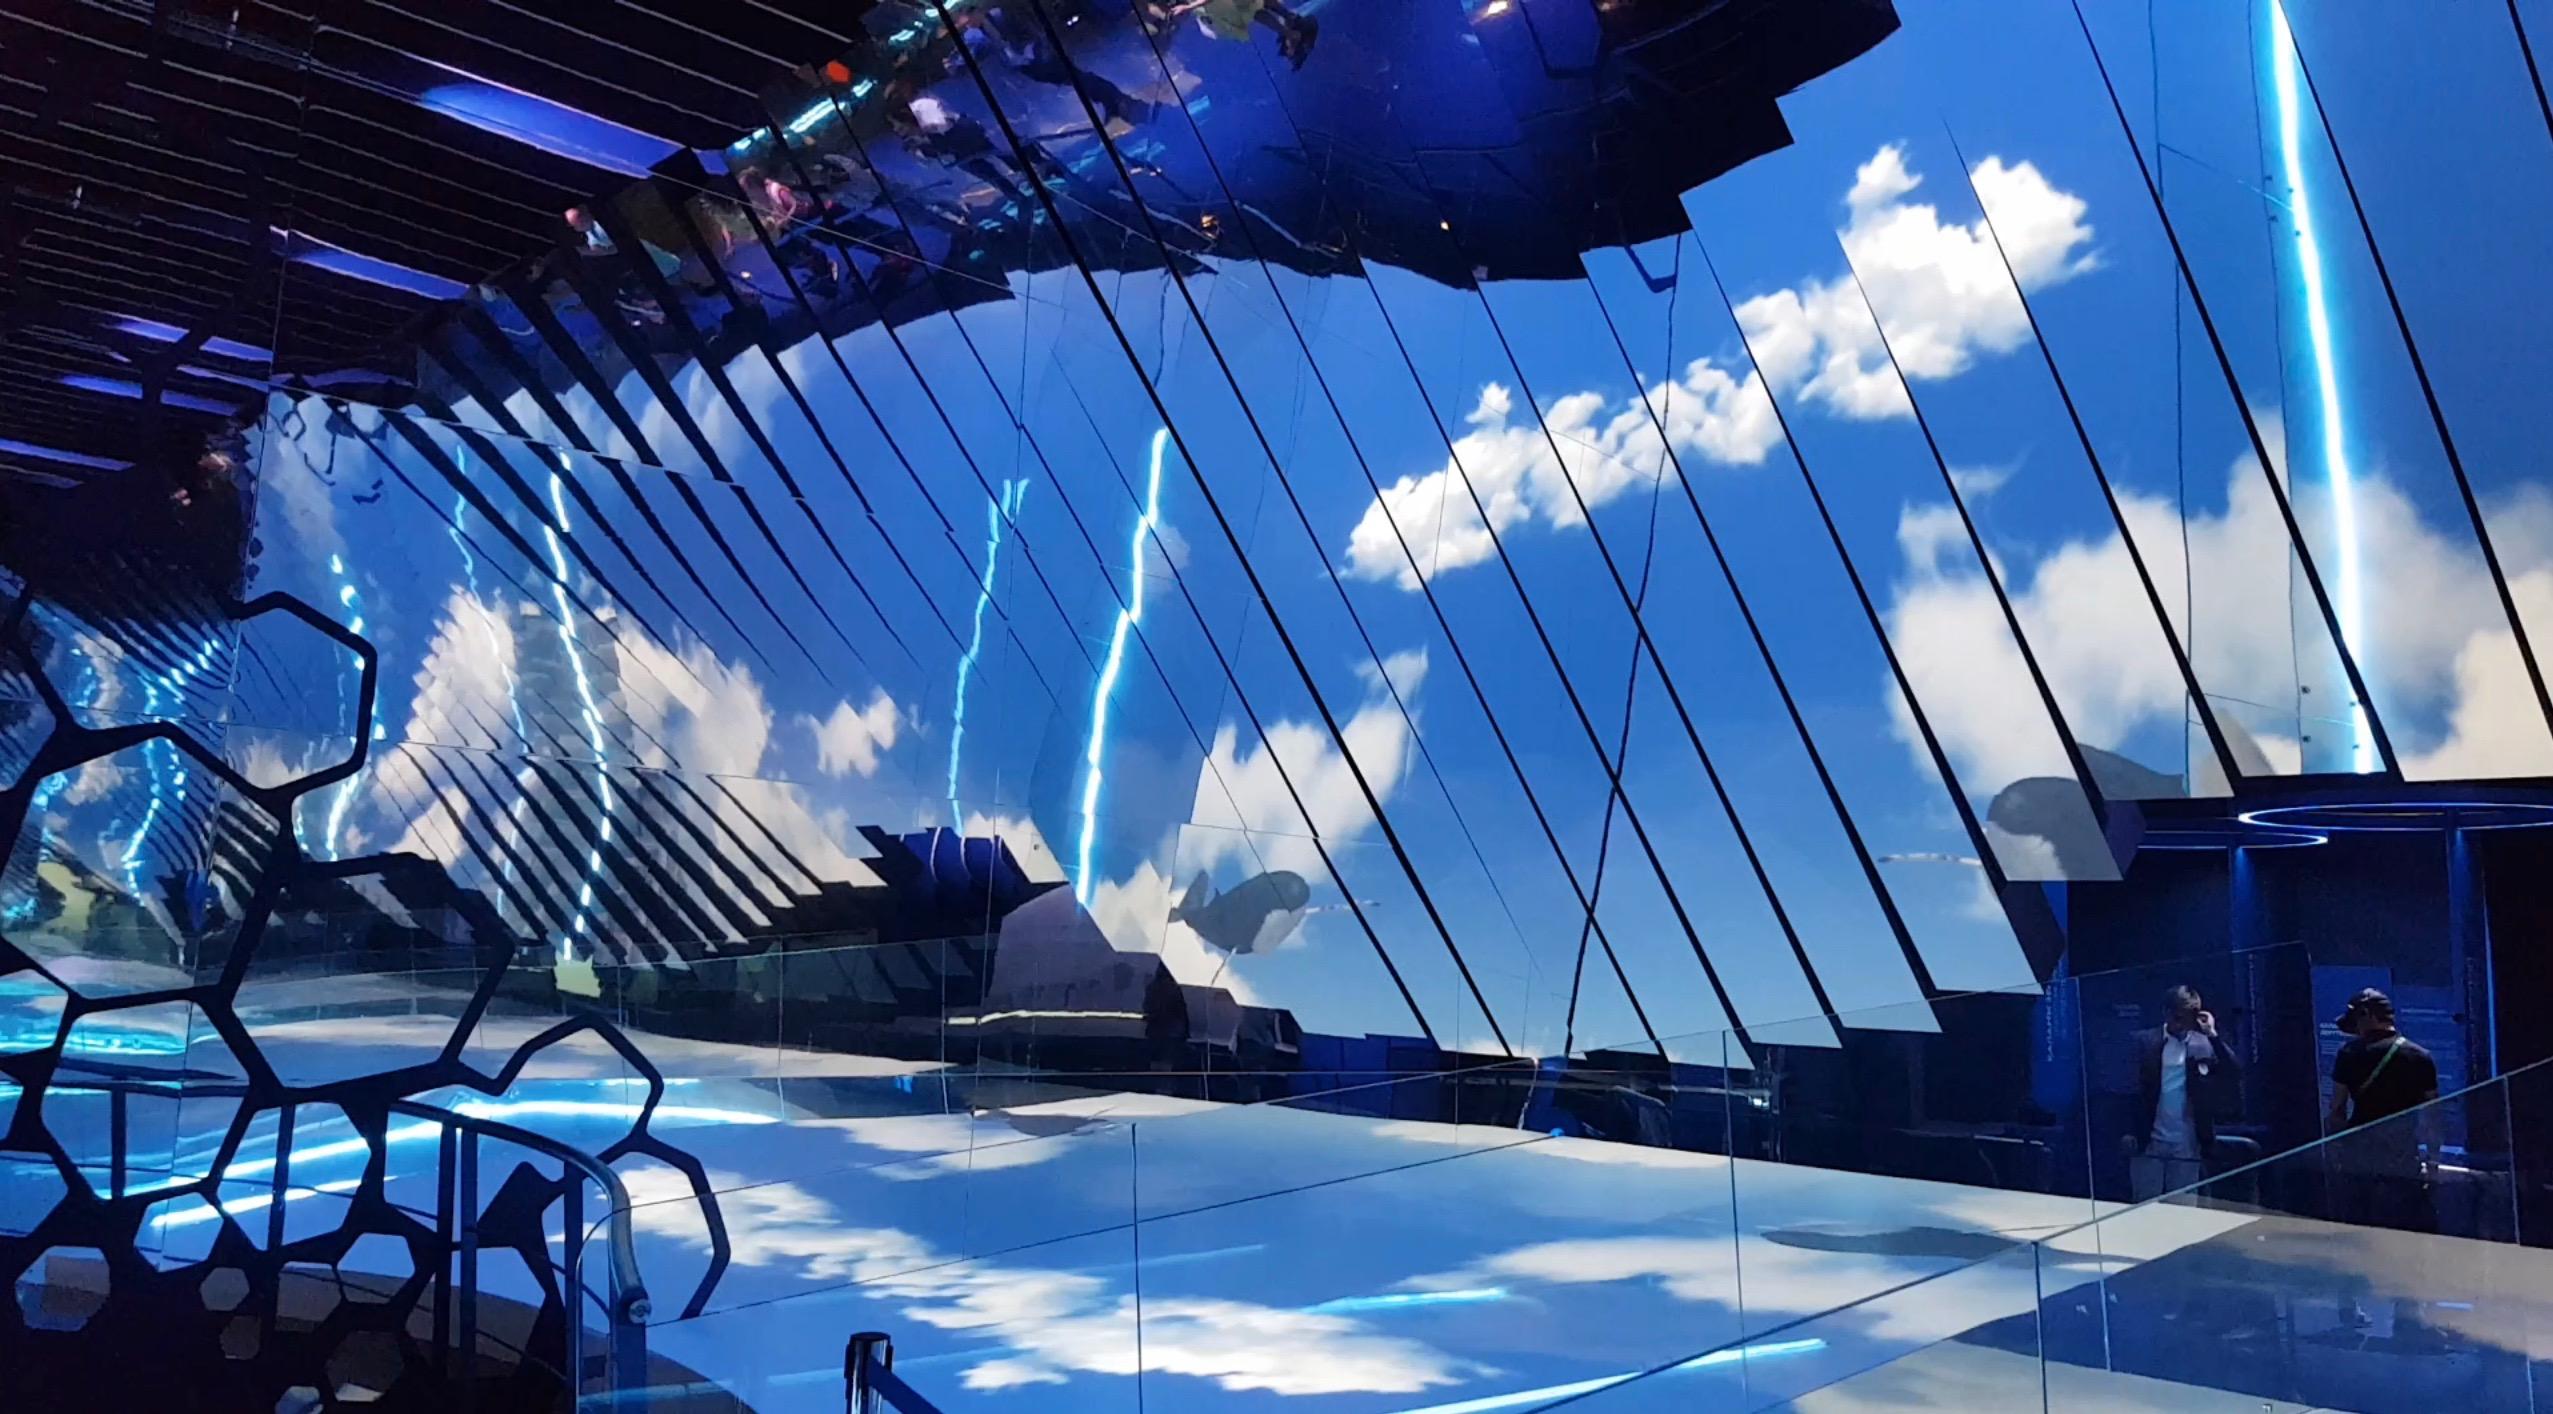 Monaco Pavilion Mirroring The Future Astonishes Crowds